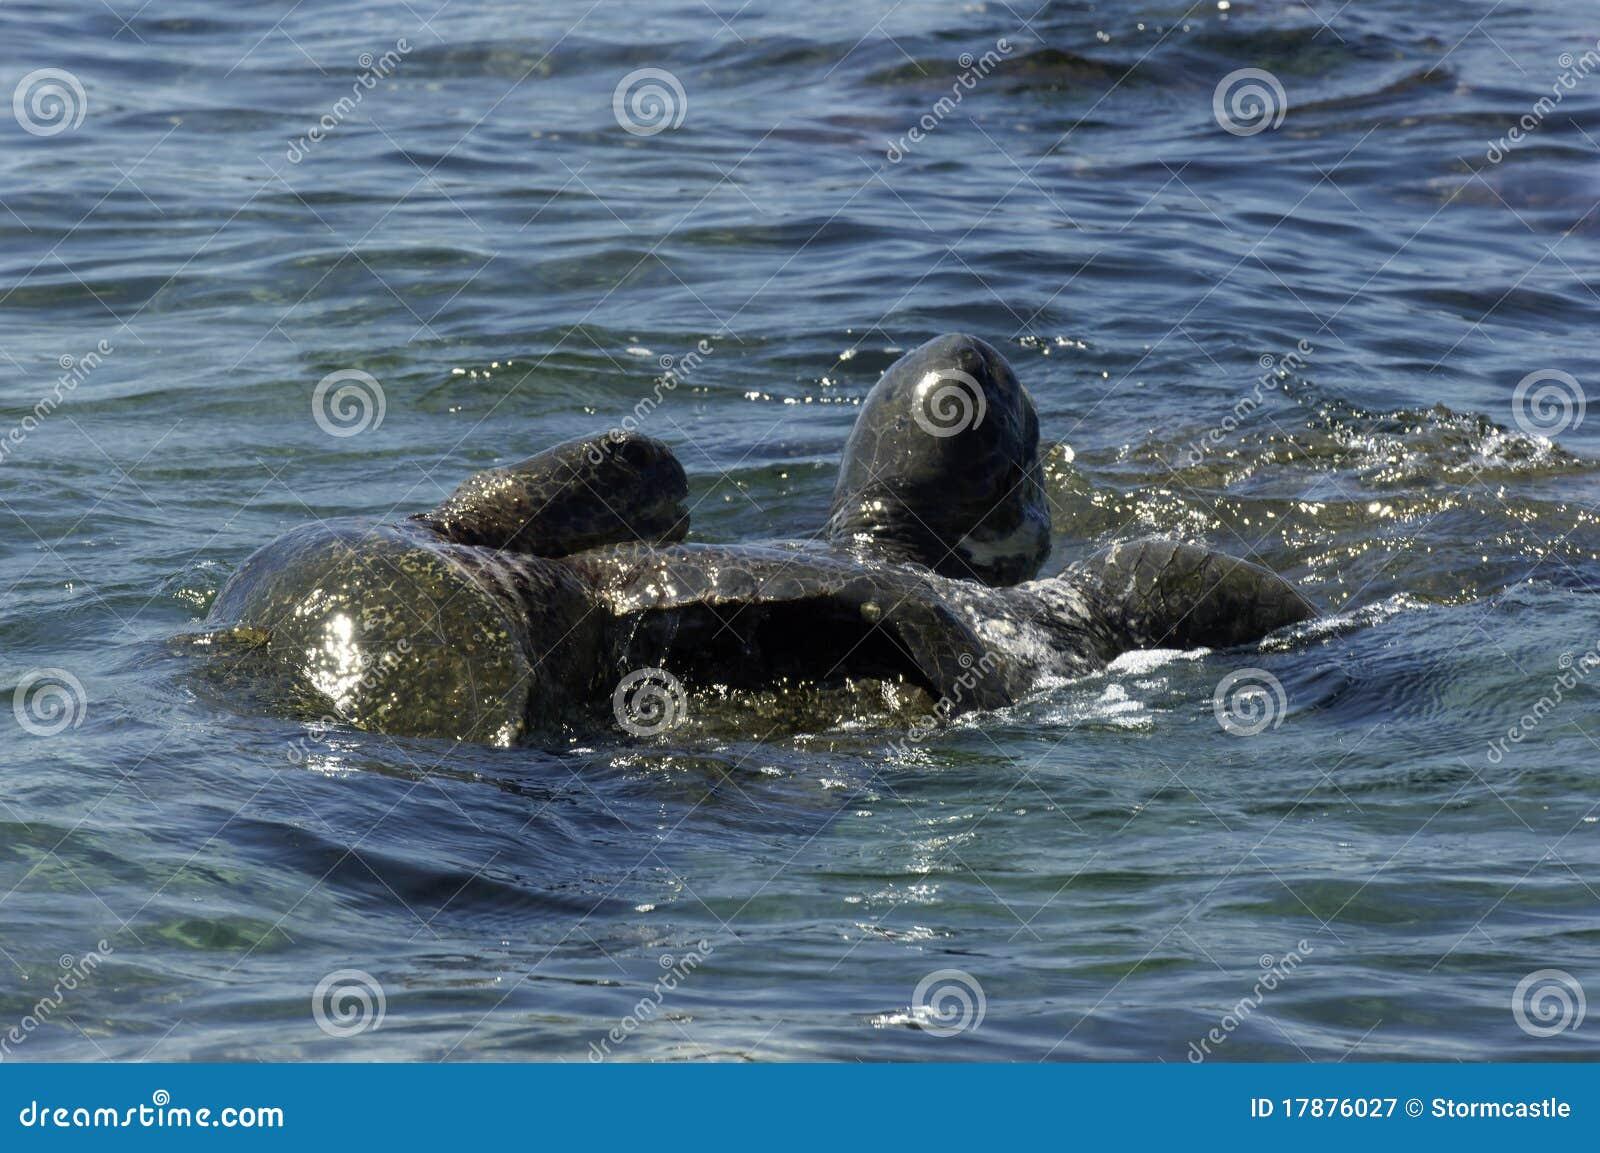 Sea Turtles Mating Stock Image Image Of Mating, Animal -8872